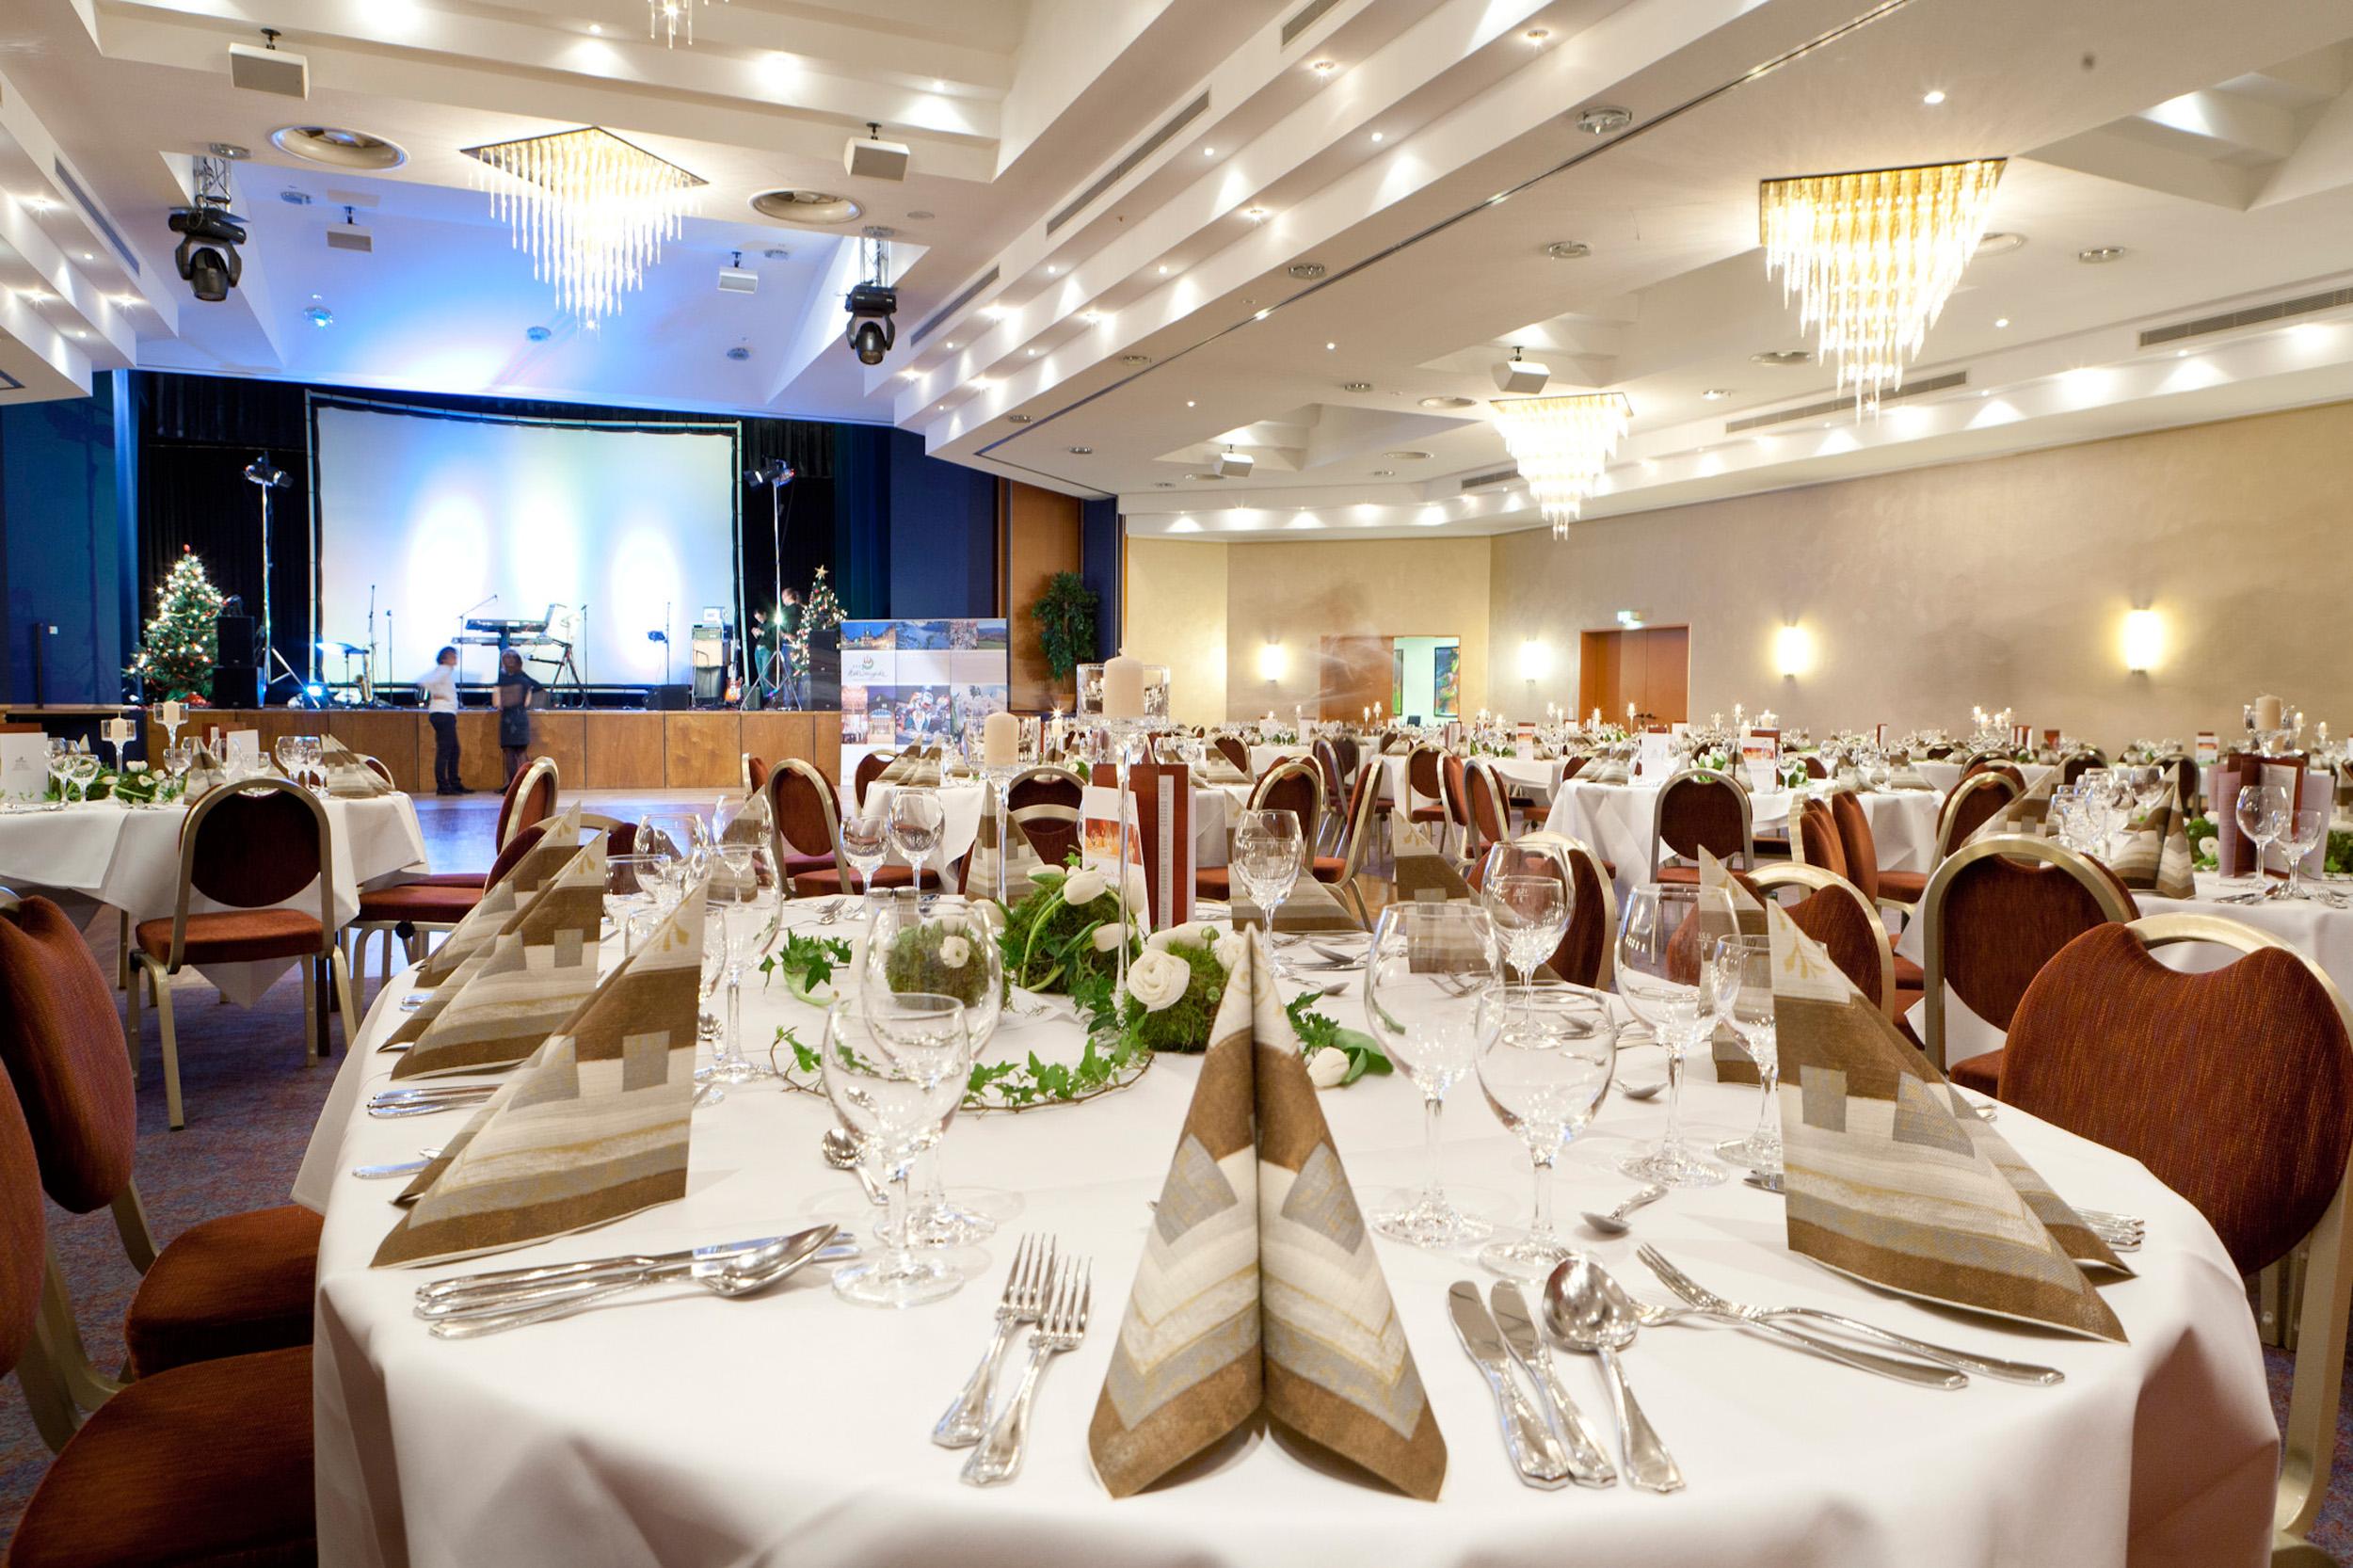 HKK Hotel Wernigerode - Bankettsaal bestuhlt